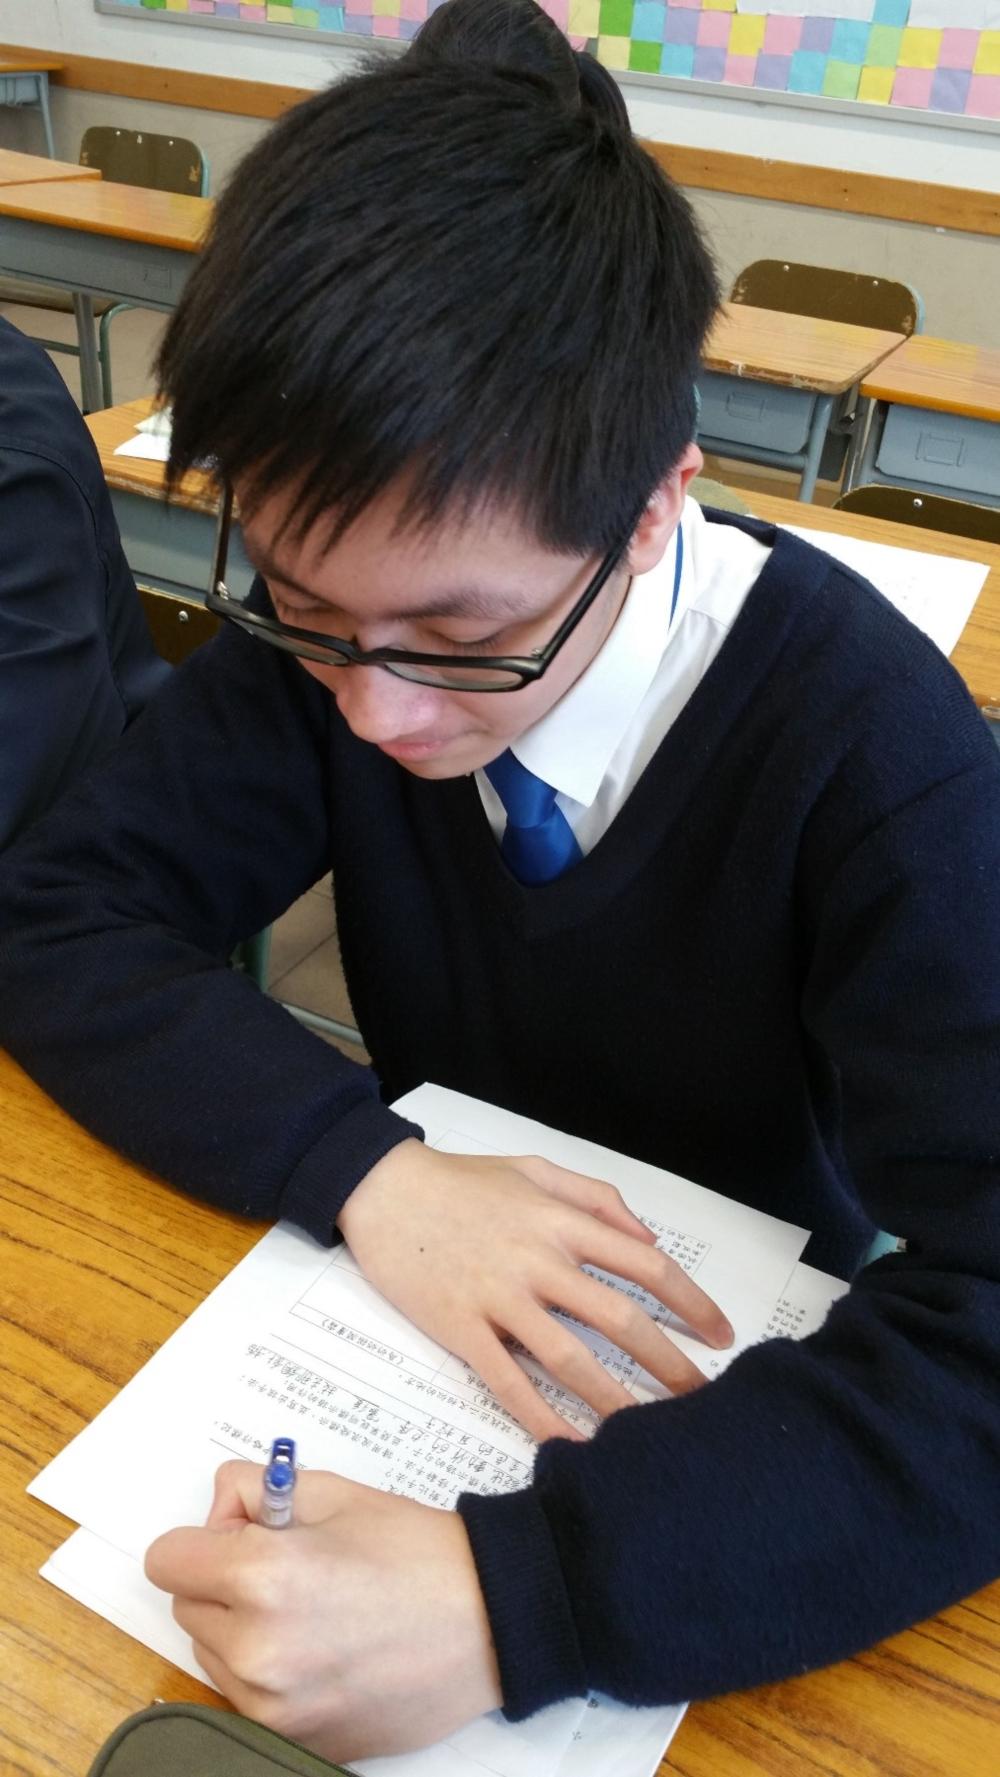 http://www.npc.edu.hk/sites/default/files/5_268.jpg